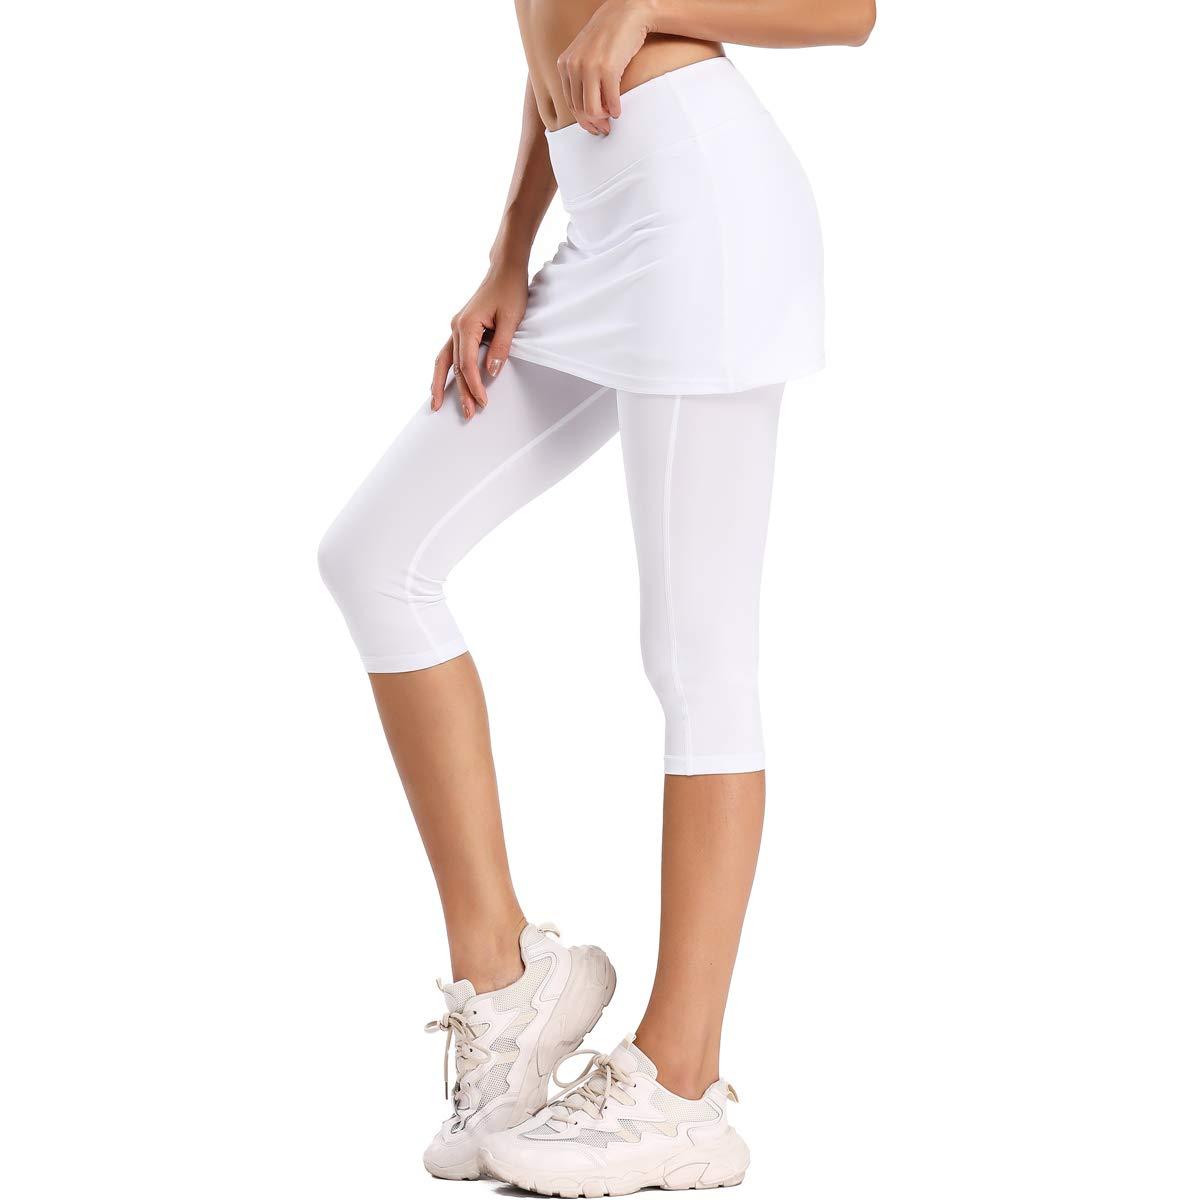 Ultrafun Women S Upf 50 Capri Skirted Leggings Tights Active Tennis Skirt With Pockets